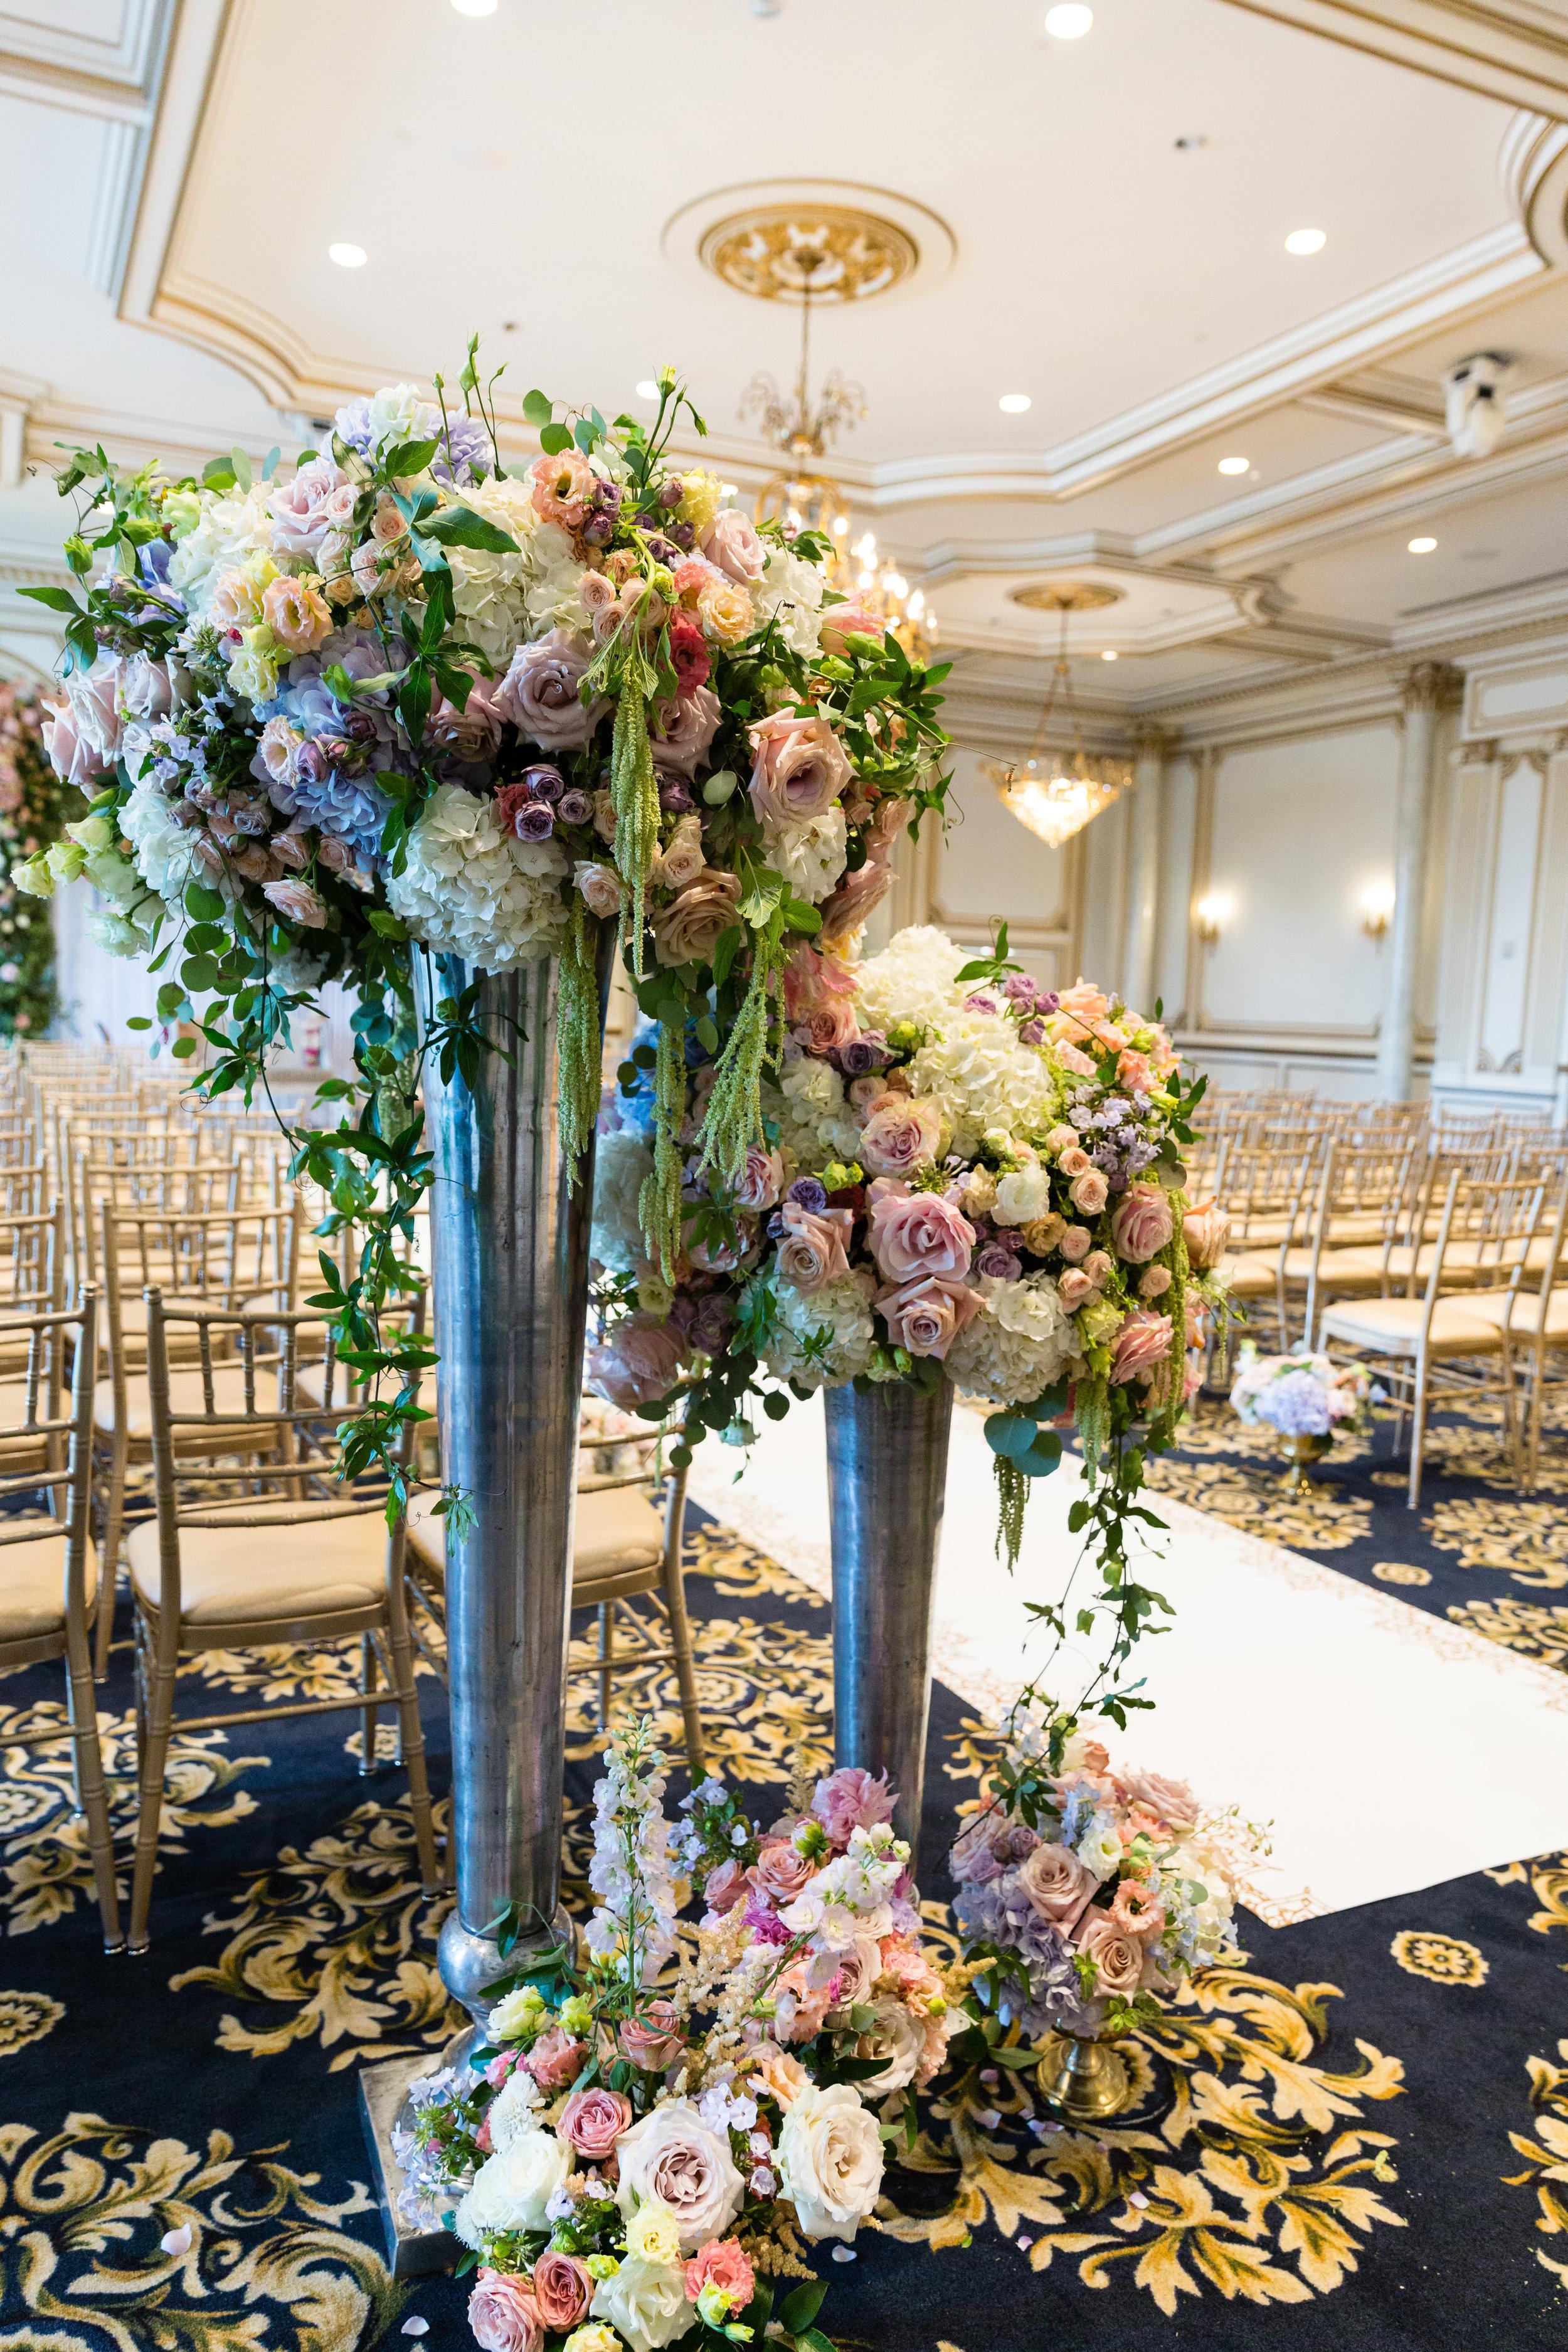 INDIAN WEDDING CEREMONY FLOWER CENTERPIECES.jpg